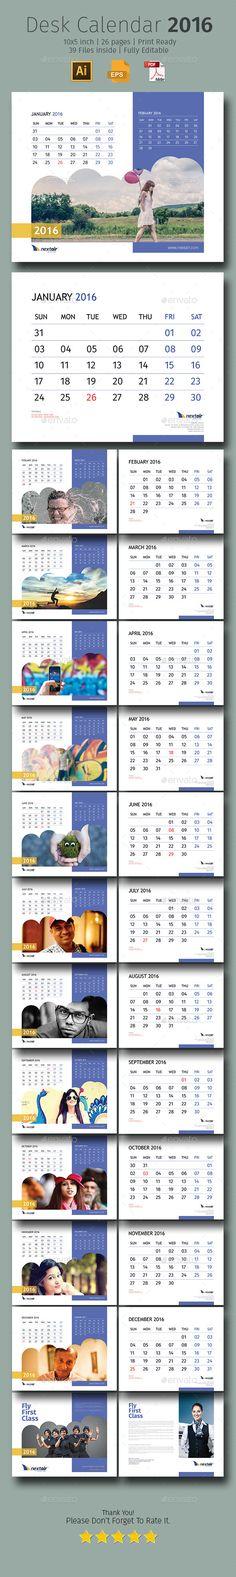 2016 Desk Calendar #design Download: http://graphicriver.net/item/2016-desk-calendar/12612192?ref=ksioks